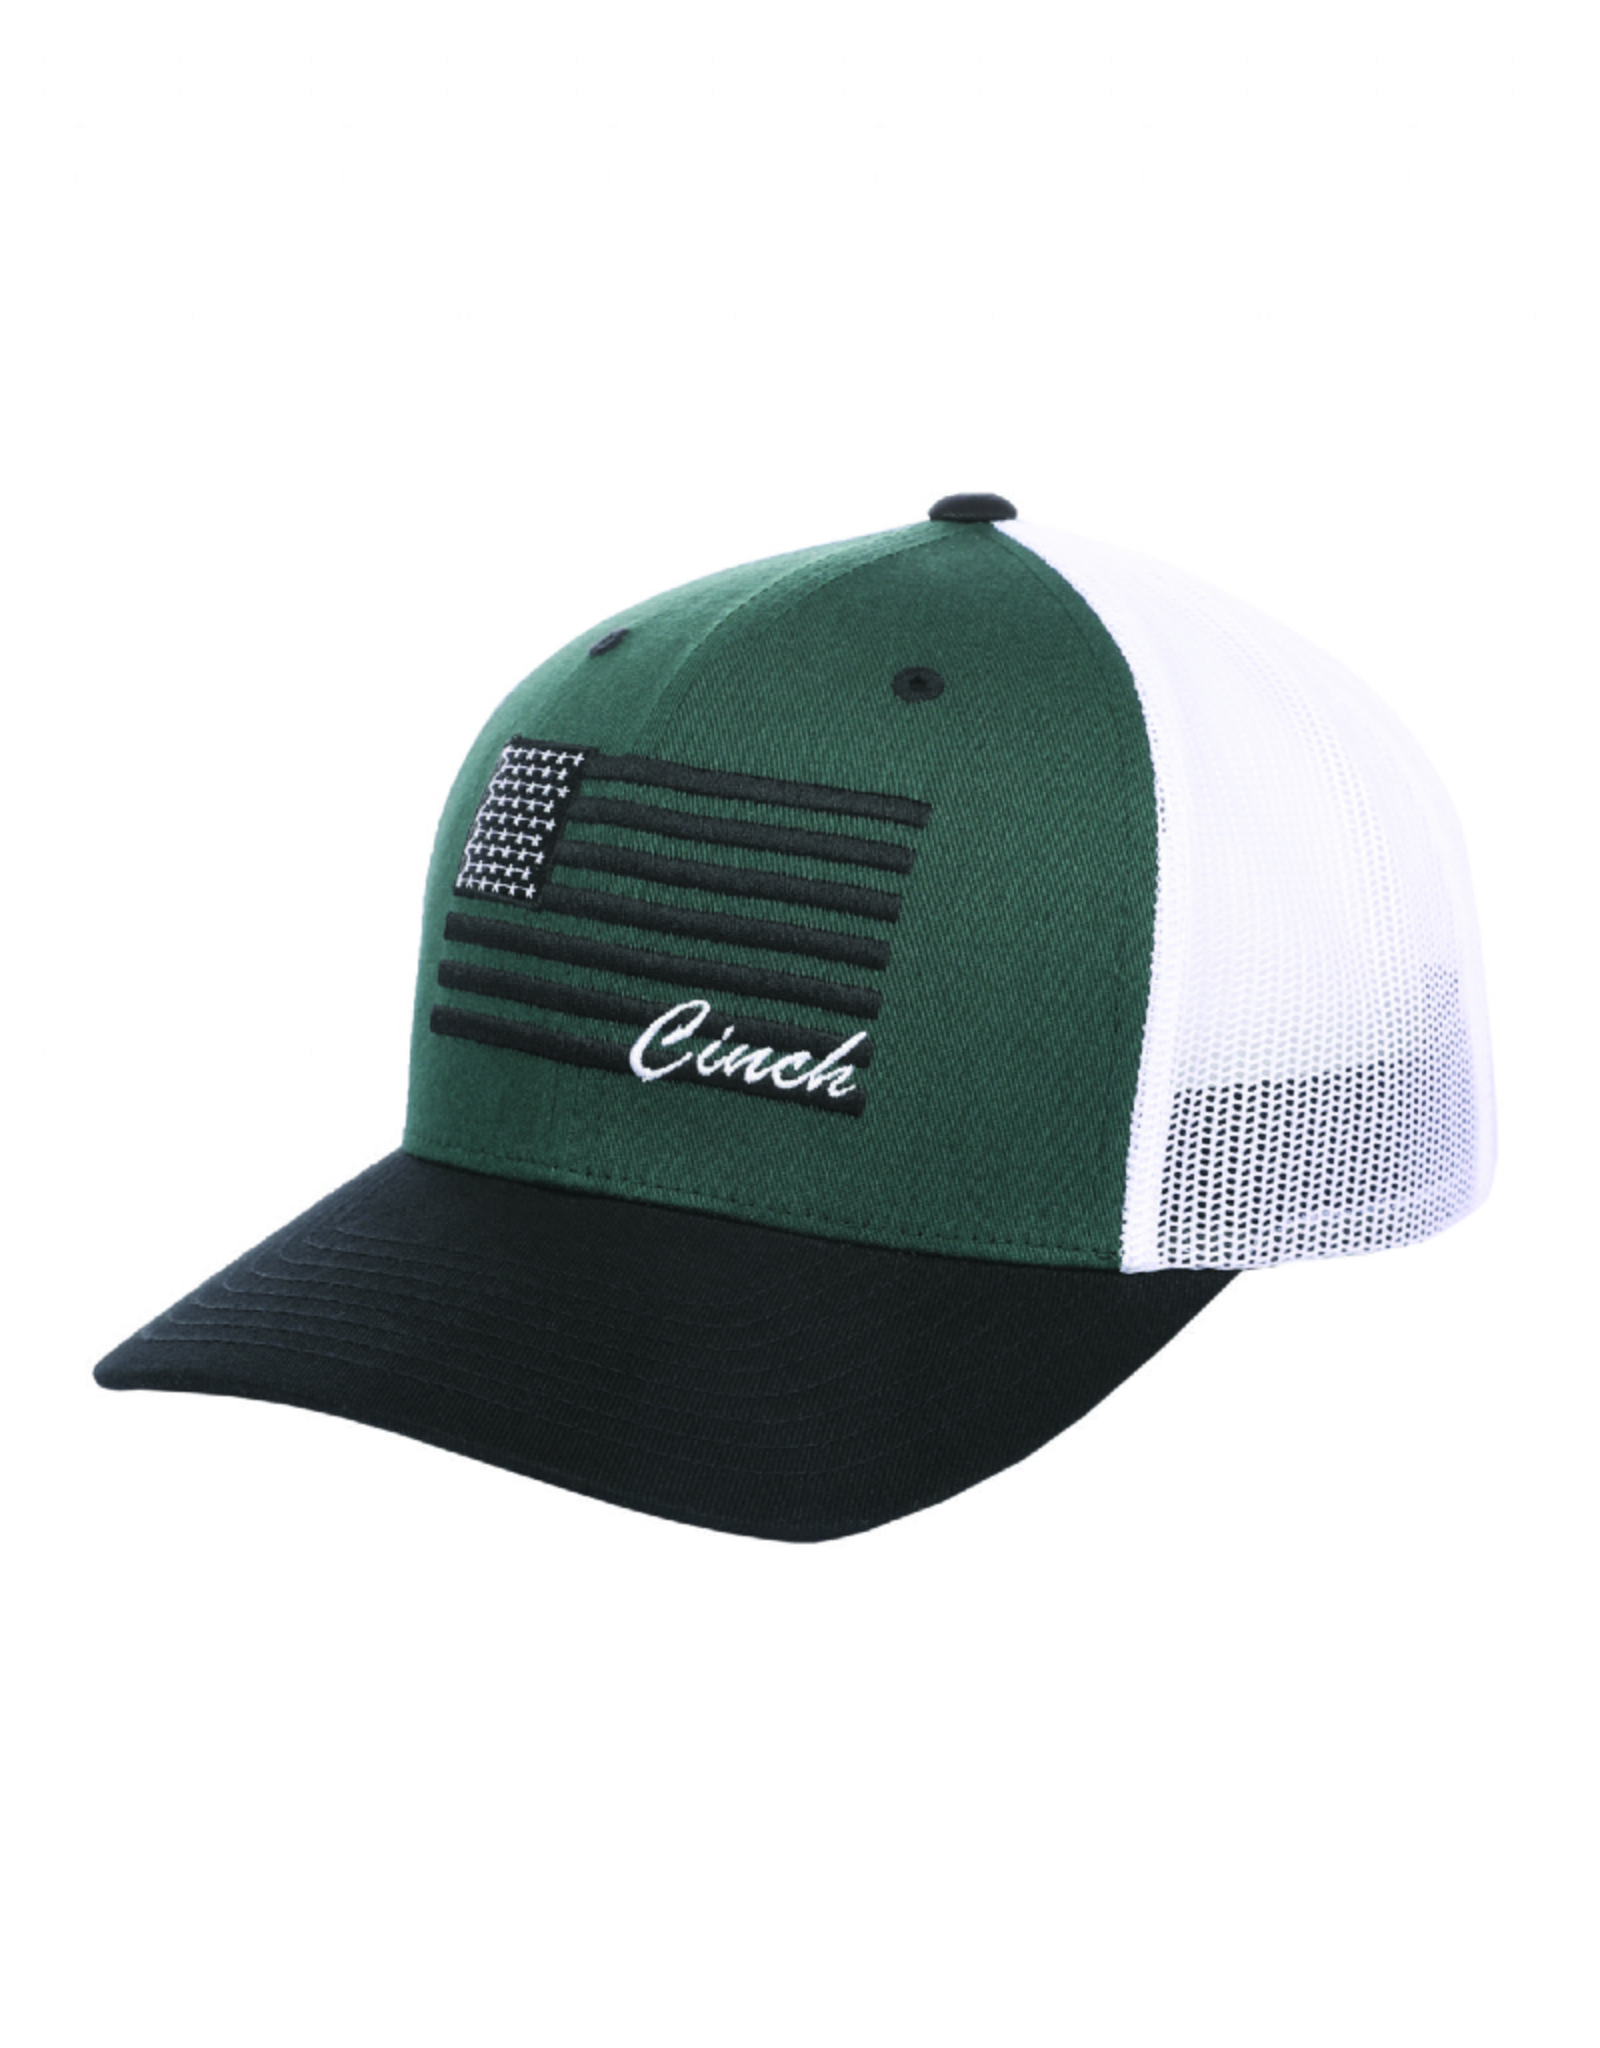 Cinch Cinch FlexFit Logo Americana Cap, Green